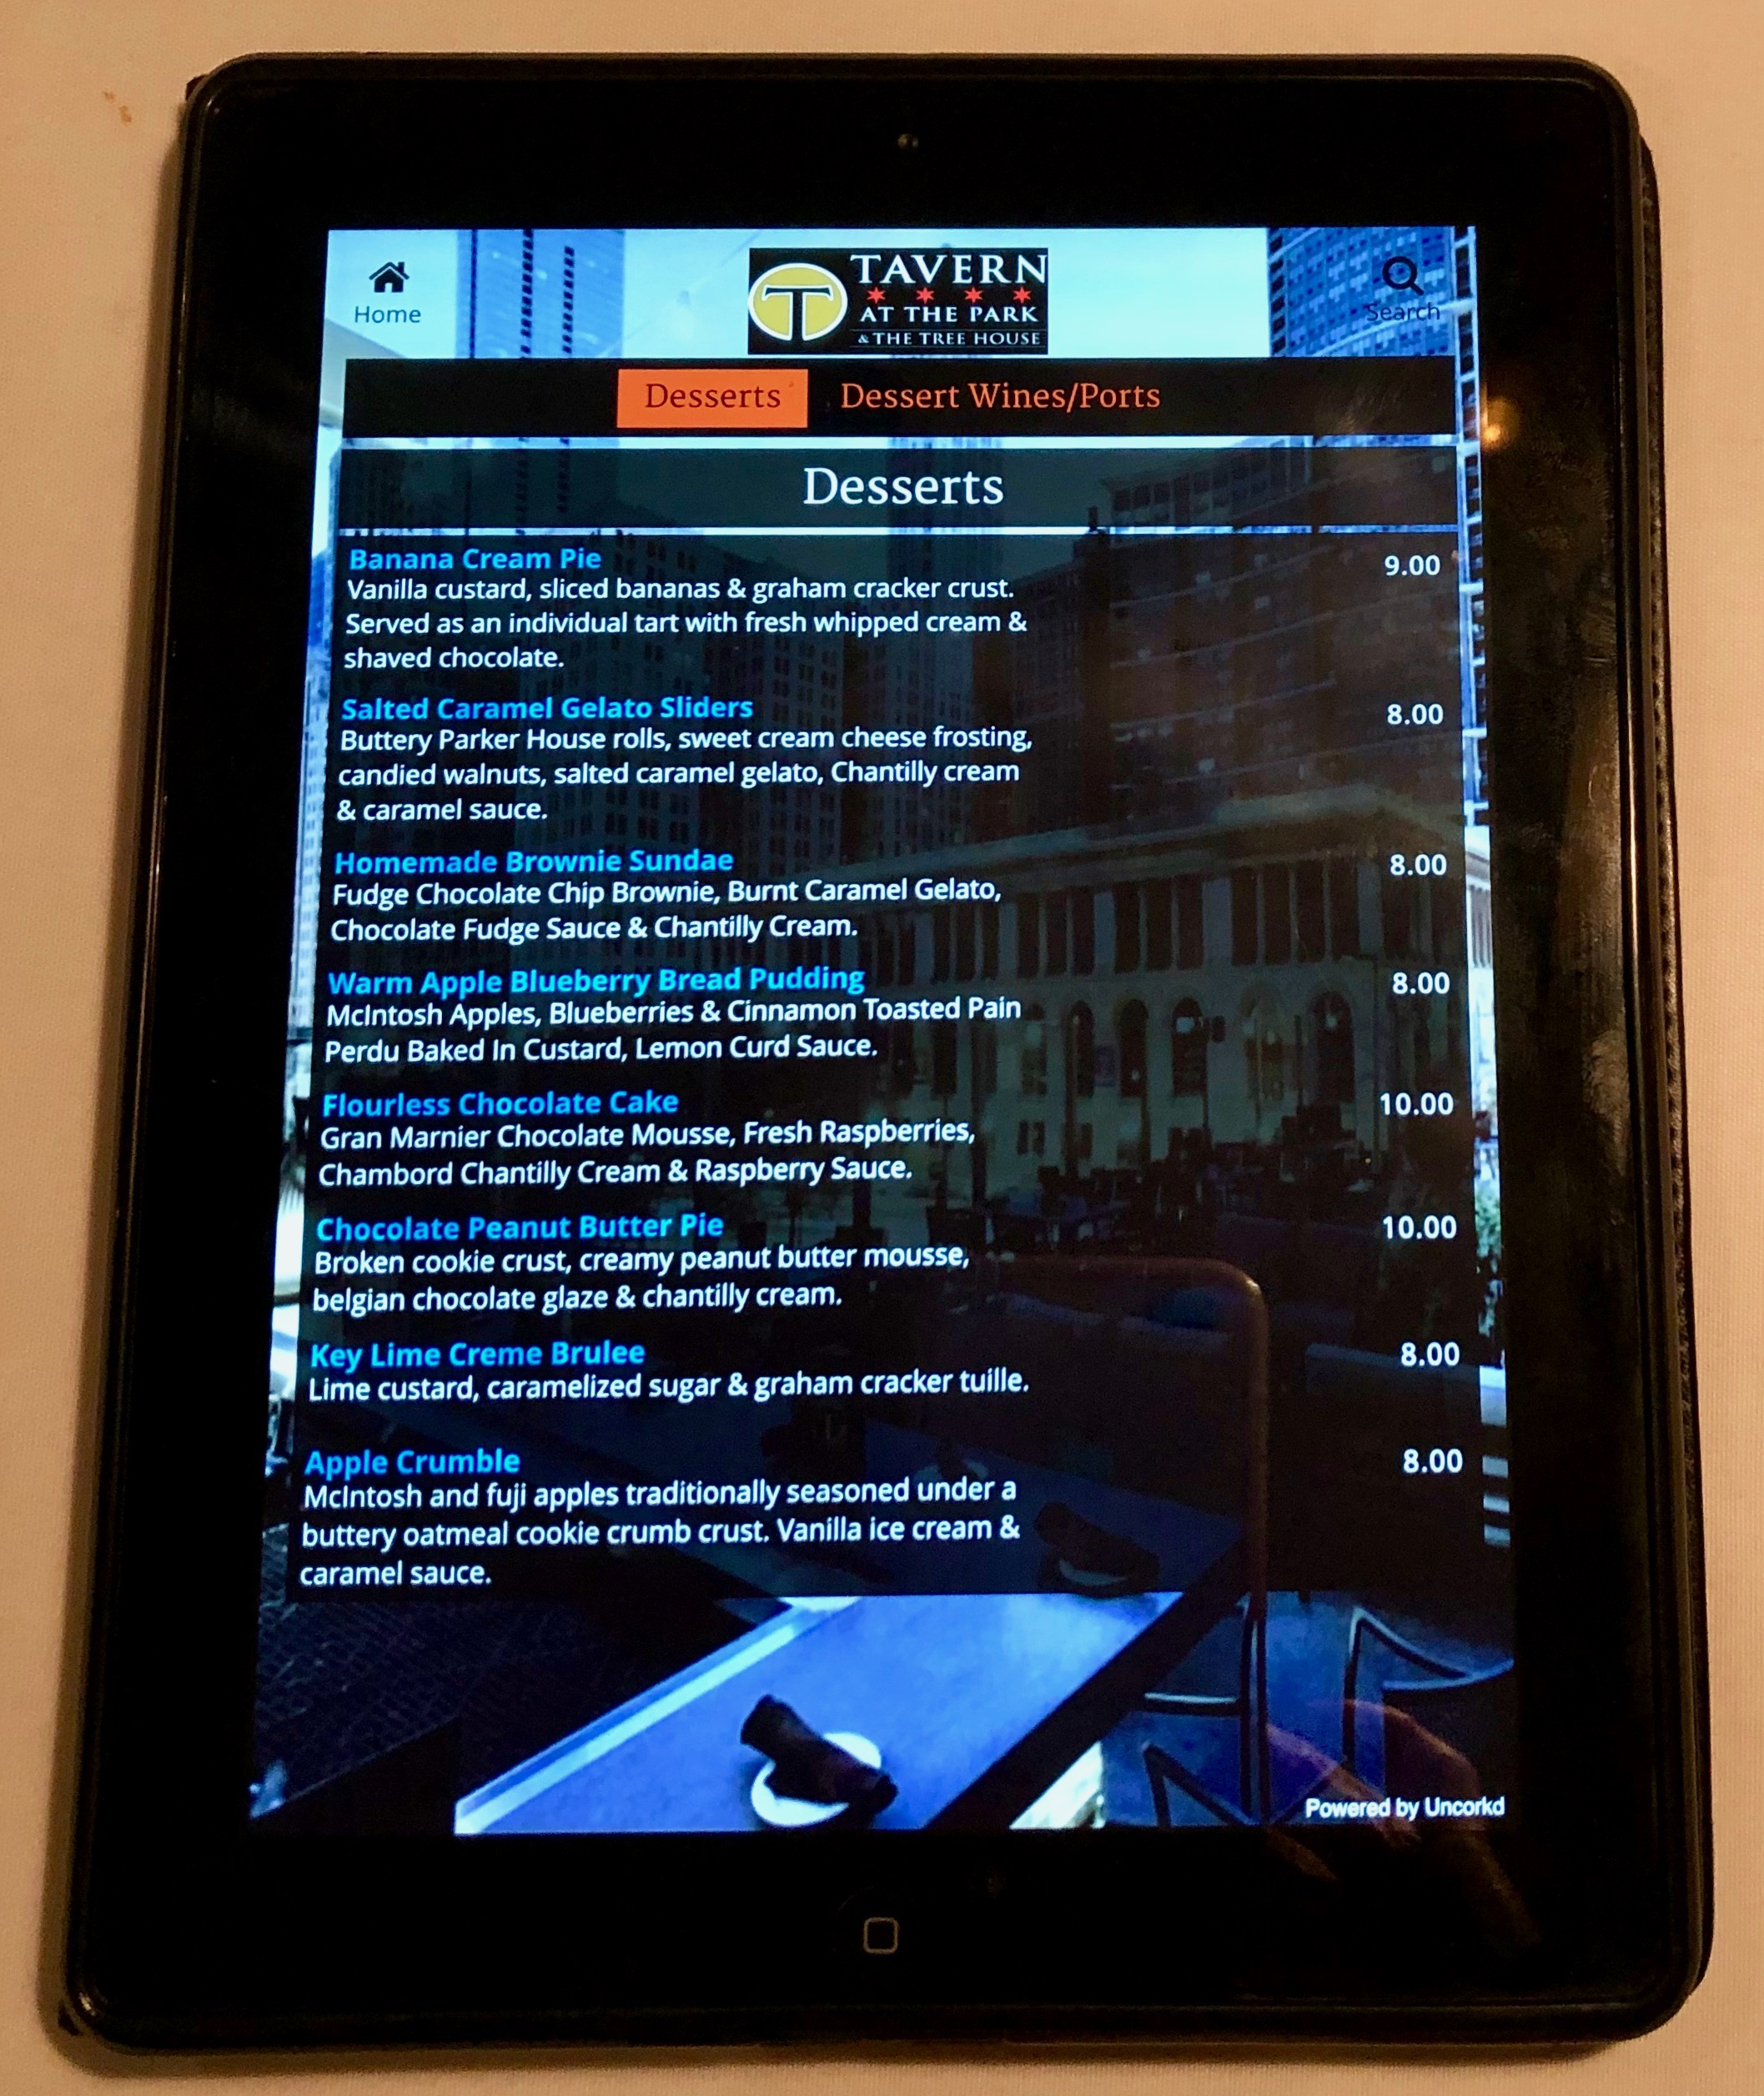 iPad dessert menu, Tavern at the Park Restaurant, Chicago, Illinois